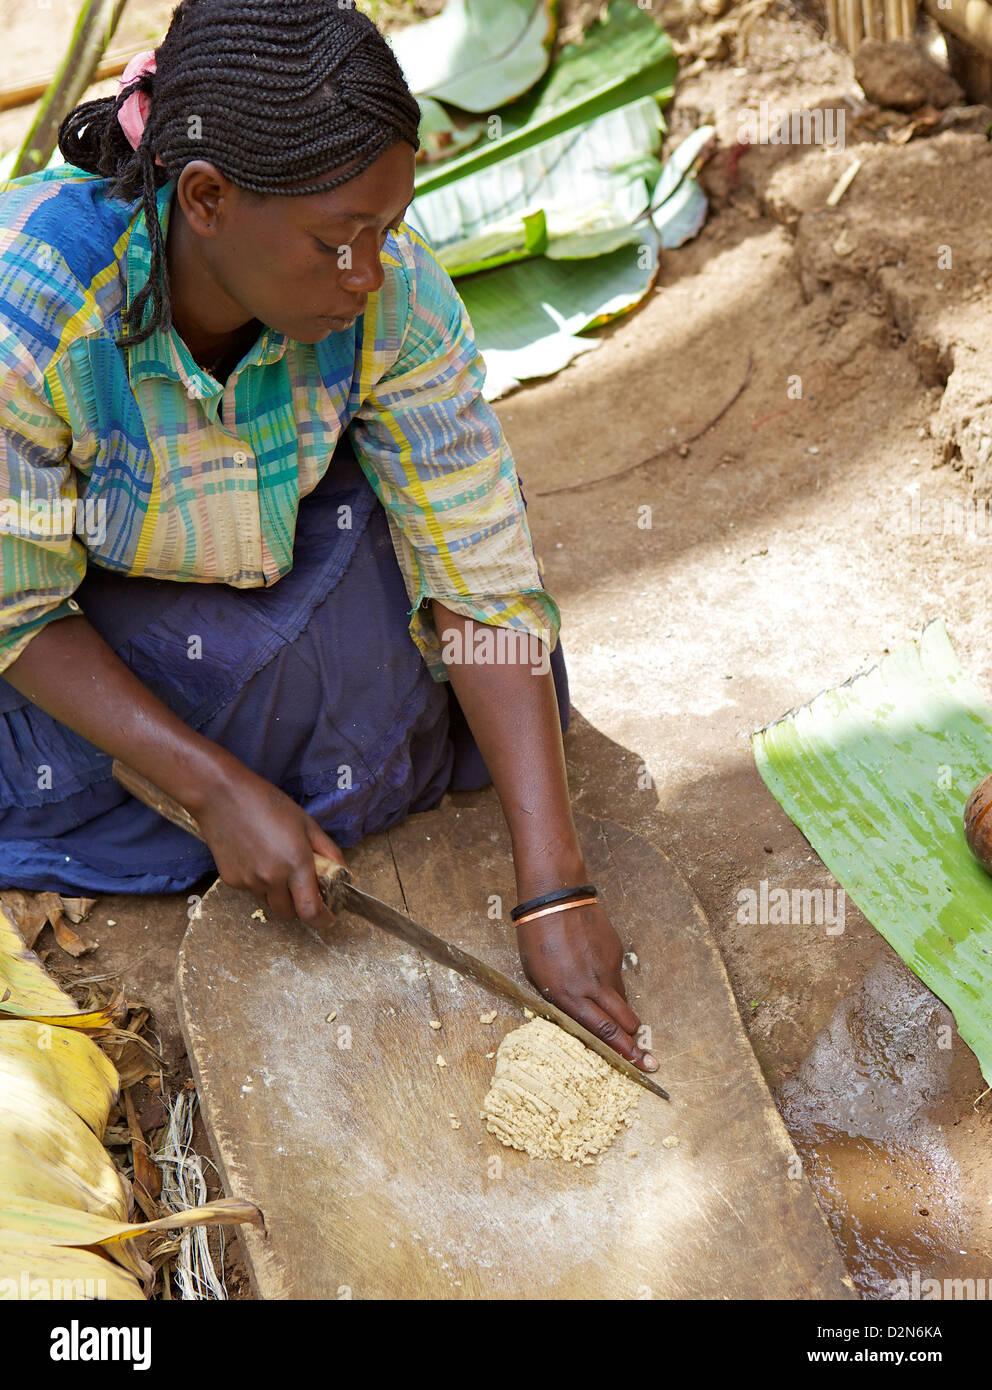 Lady hacken falschen Banane Chencha, Dorze, Äthiopien, Afrika Stockbild